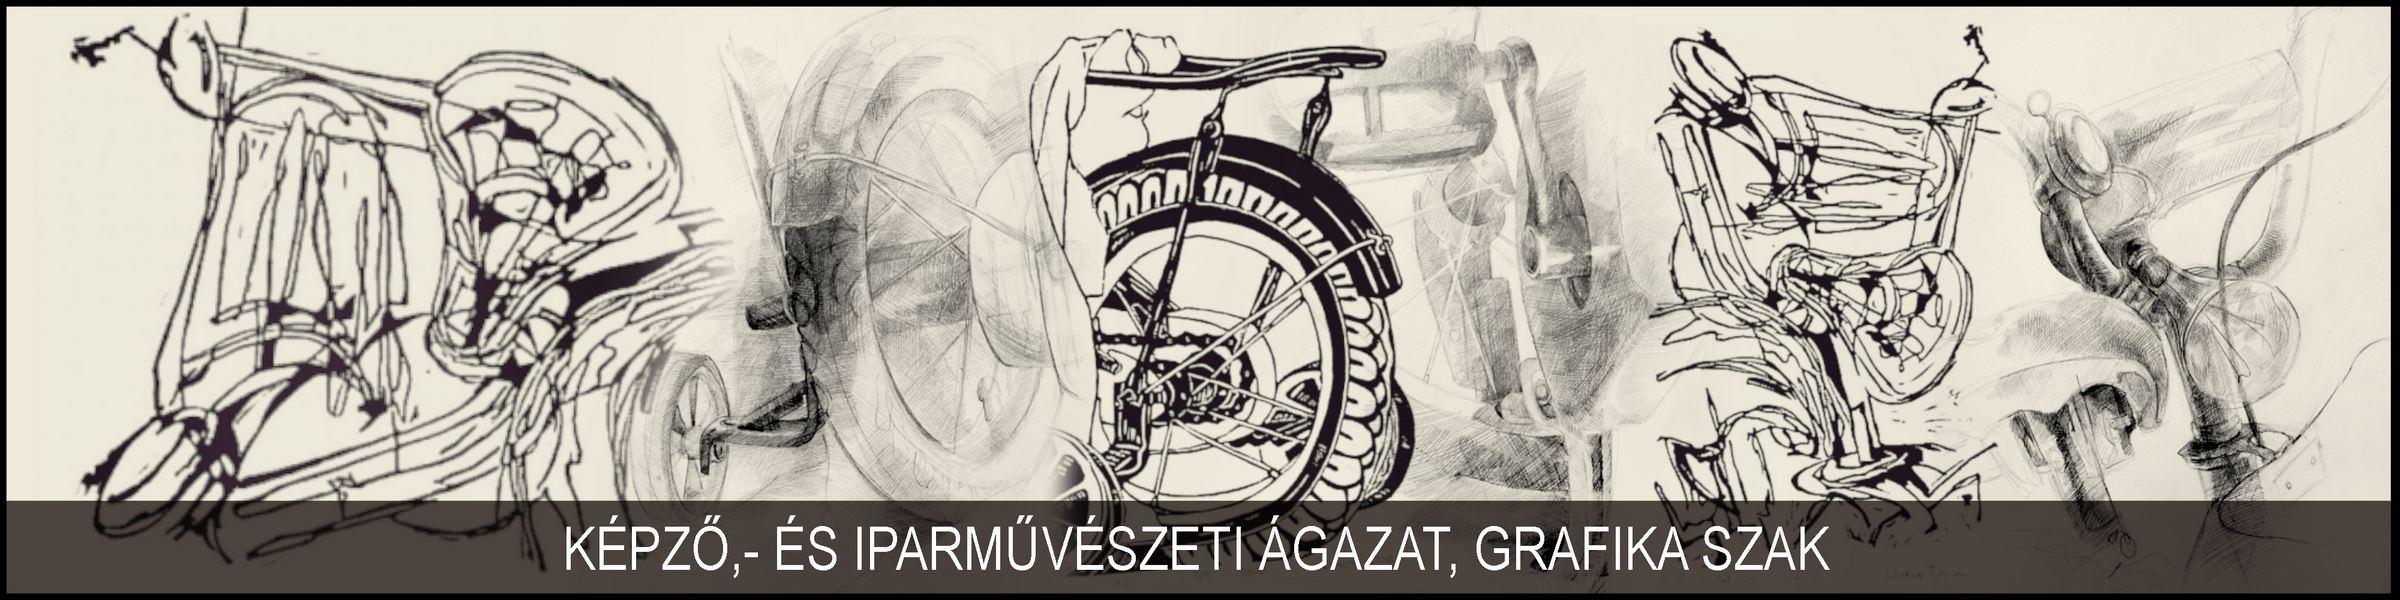 GRAFIKUS SZAK